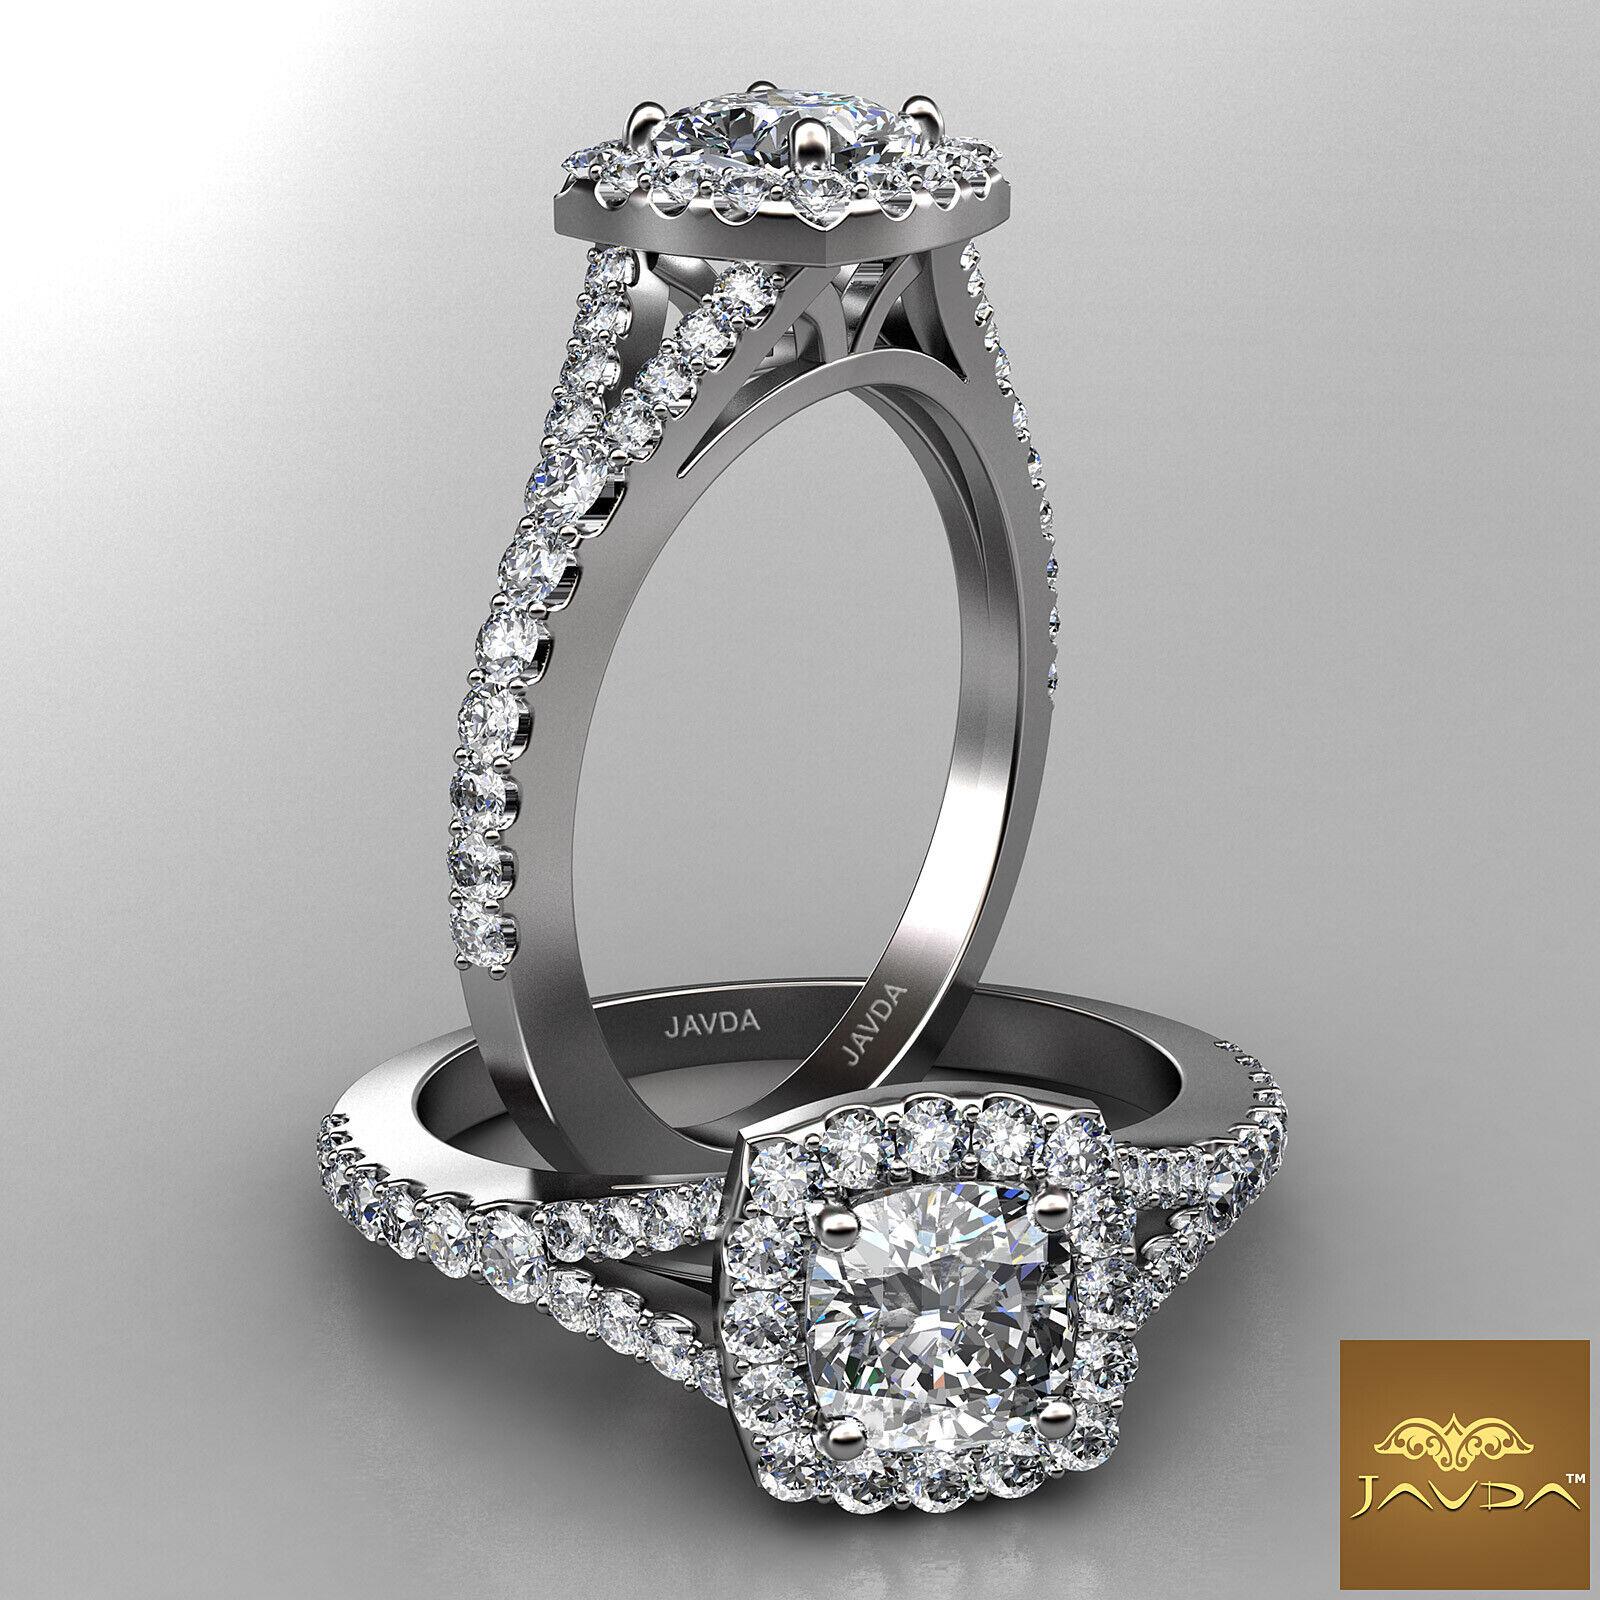 Cushion Diamond Engagement GIA H Color VS2 18k White Gold Halo Pave Set Ring 1Ct